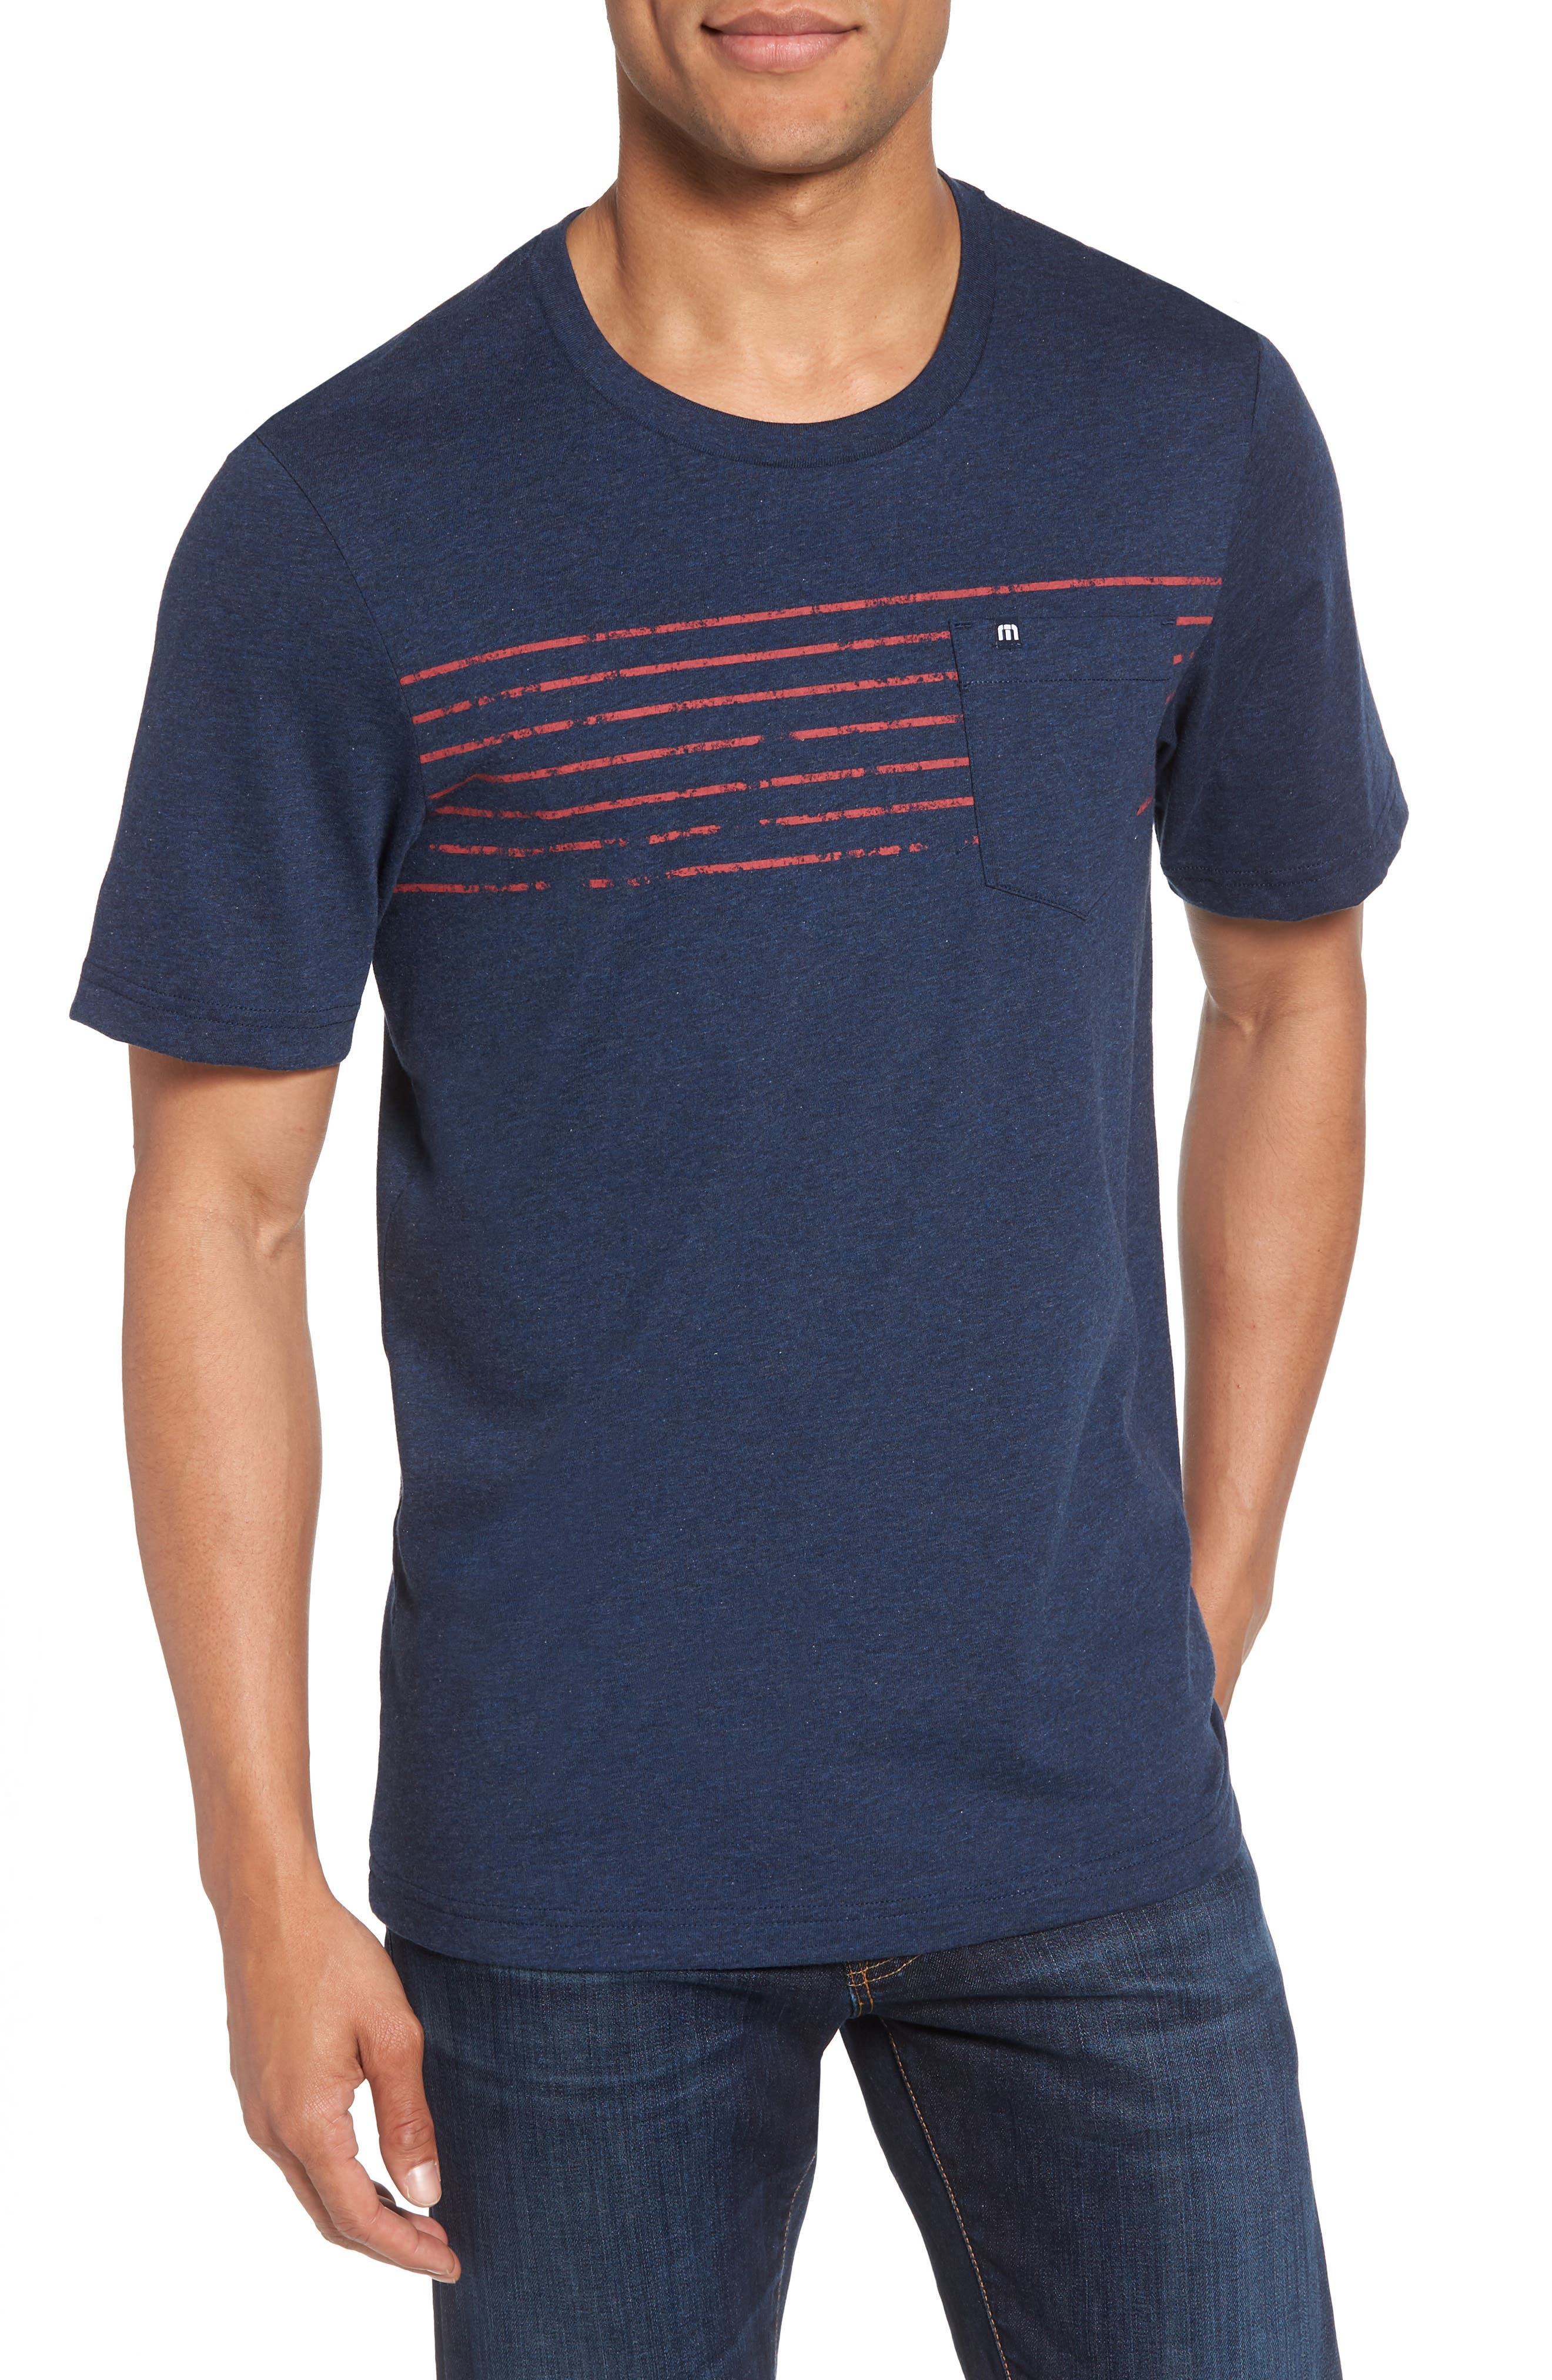 Bogue Pocket T-Shirt,                         Main,                         color, Heather Blue Nights